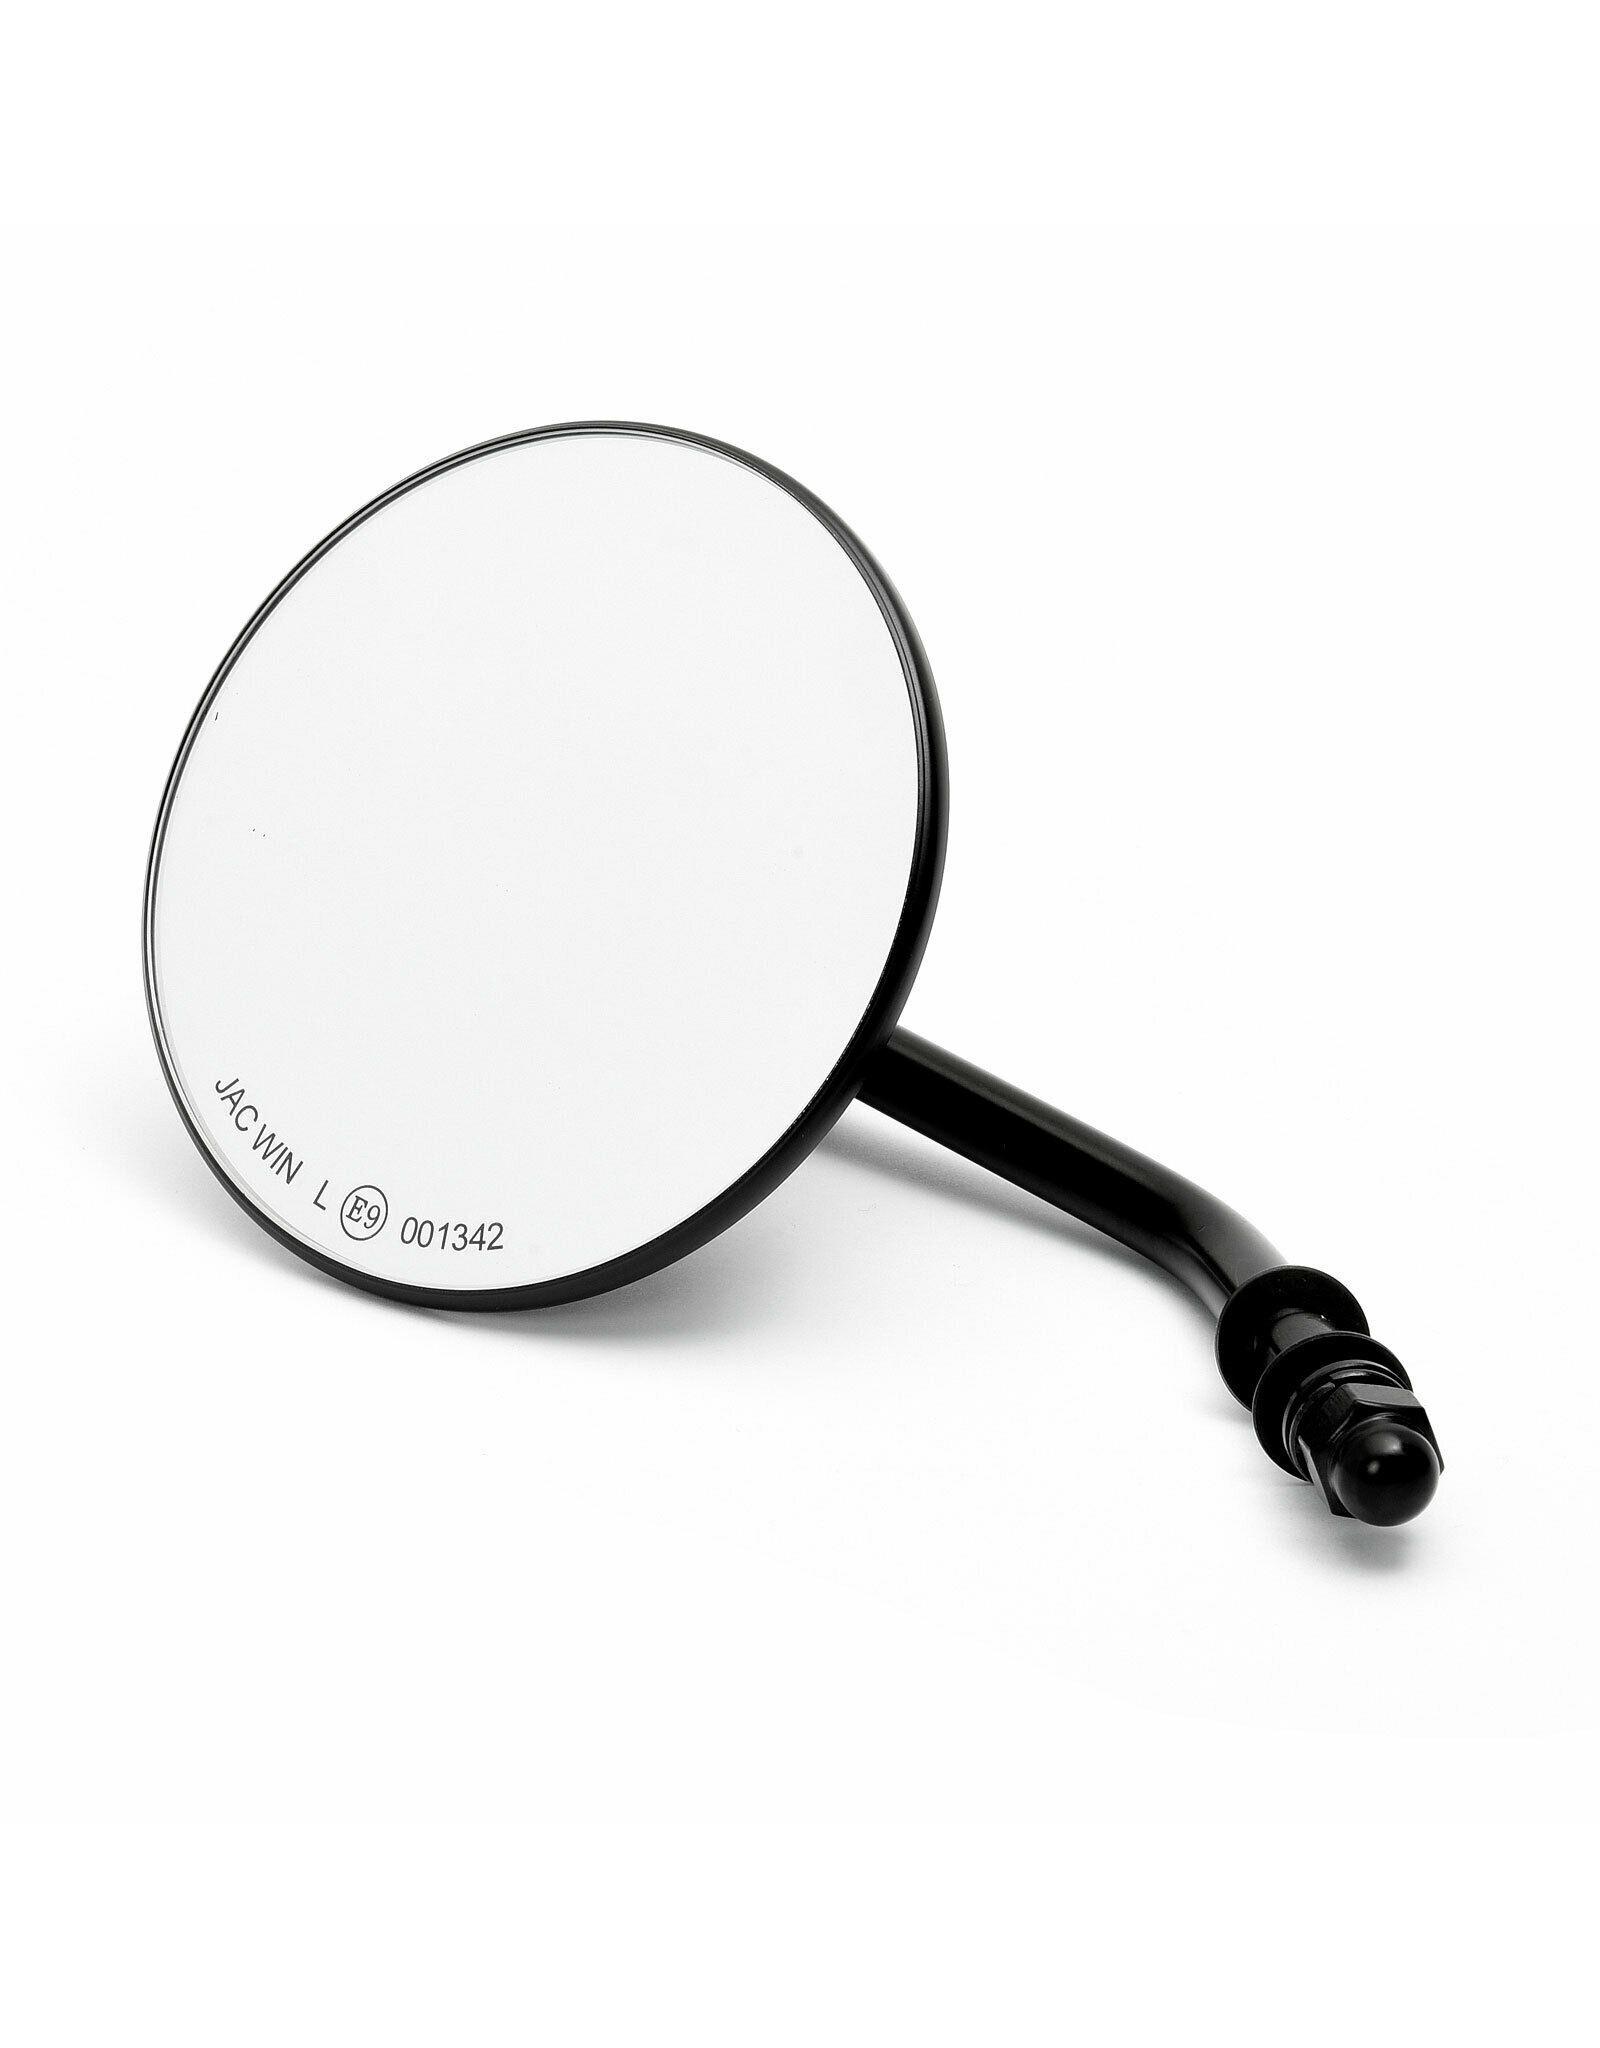 Custom spiegel 4 inch voor Harley Davidson